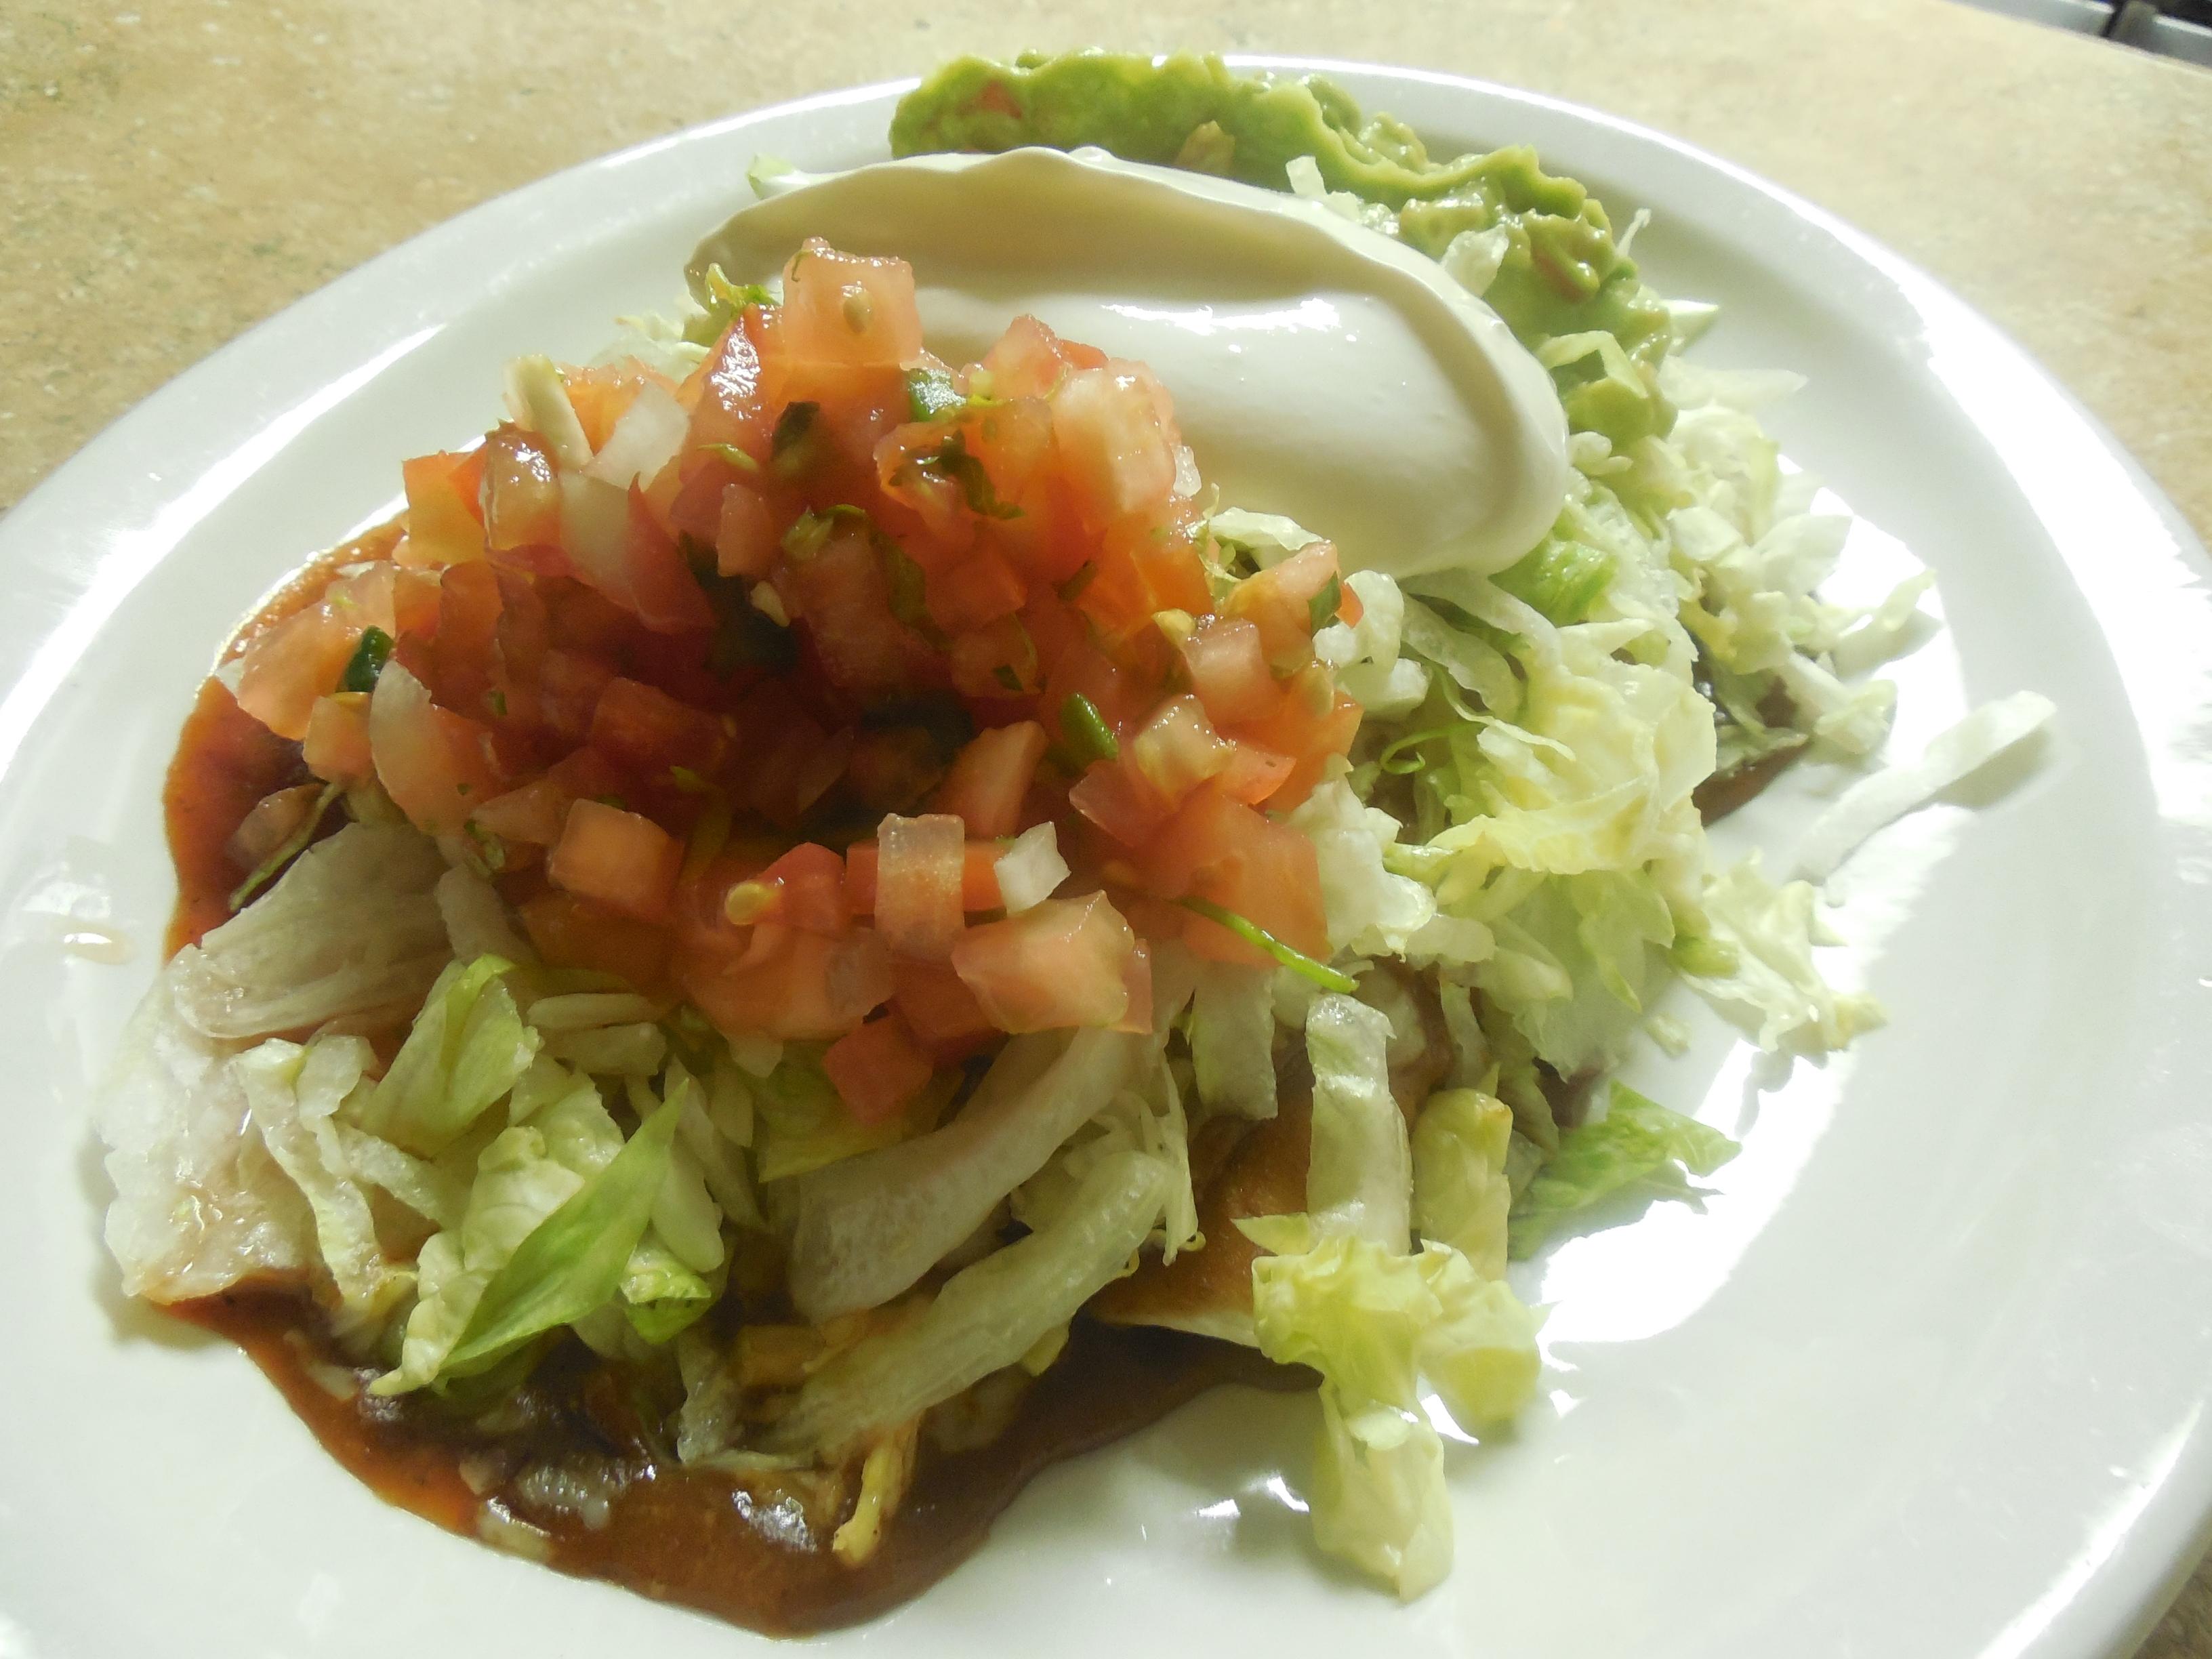 Burrito Delux